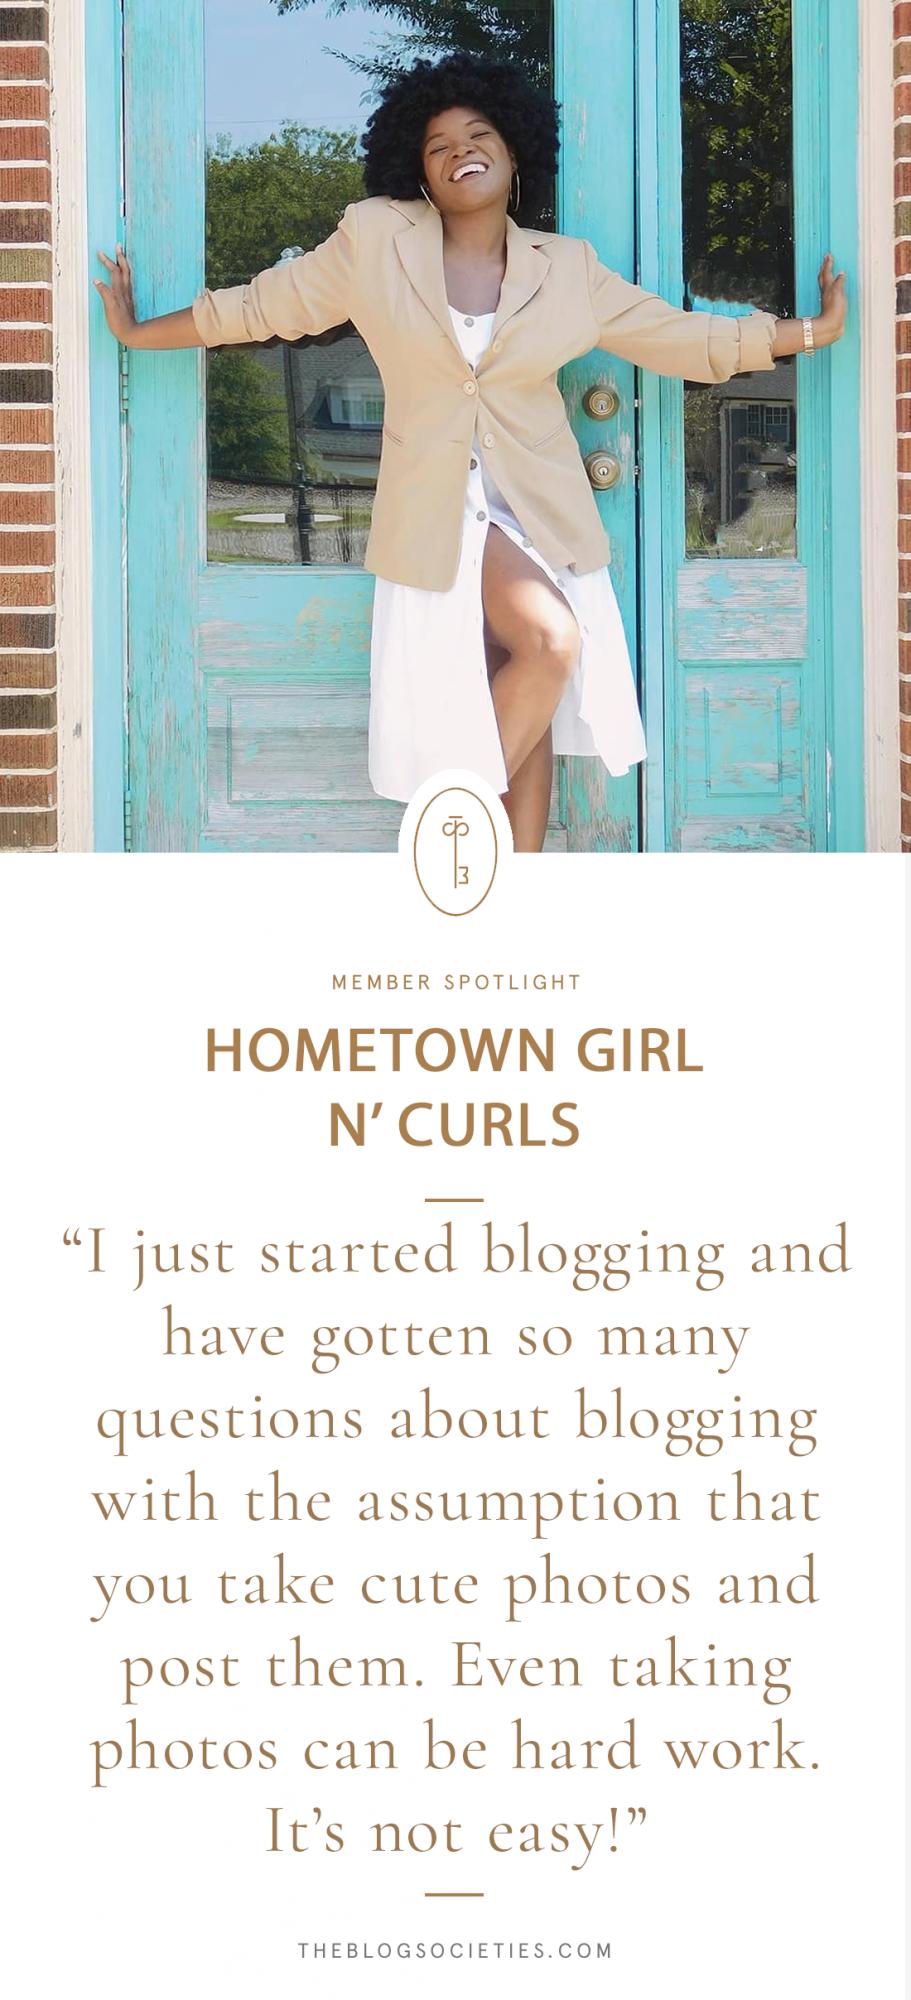 Yalana of Hometown Girl N' Curls